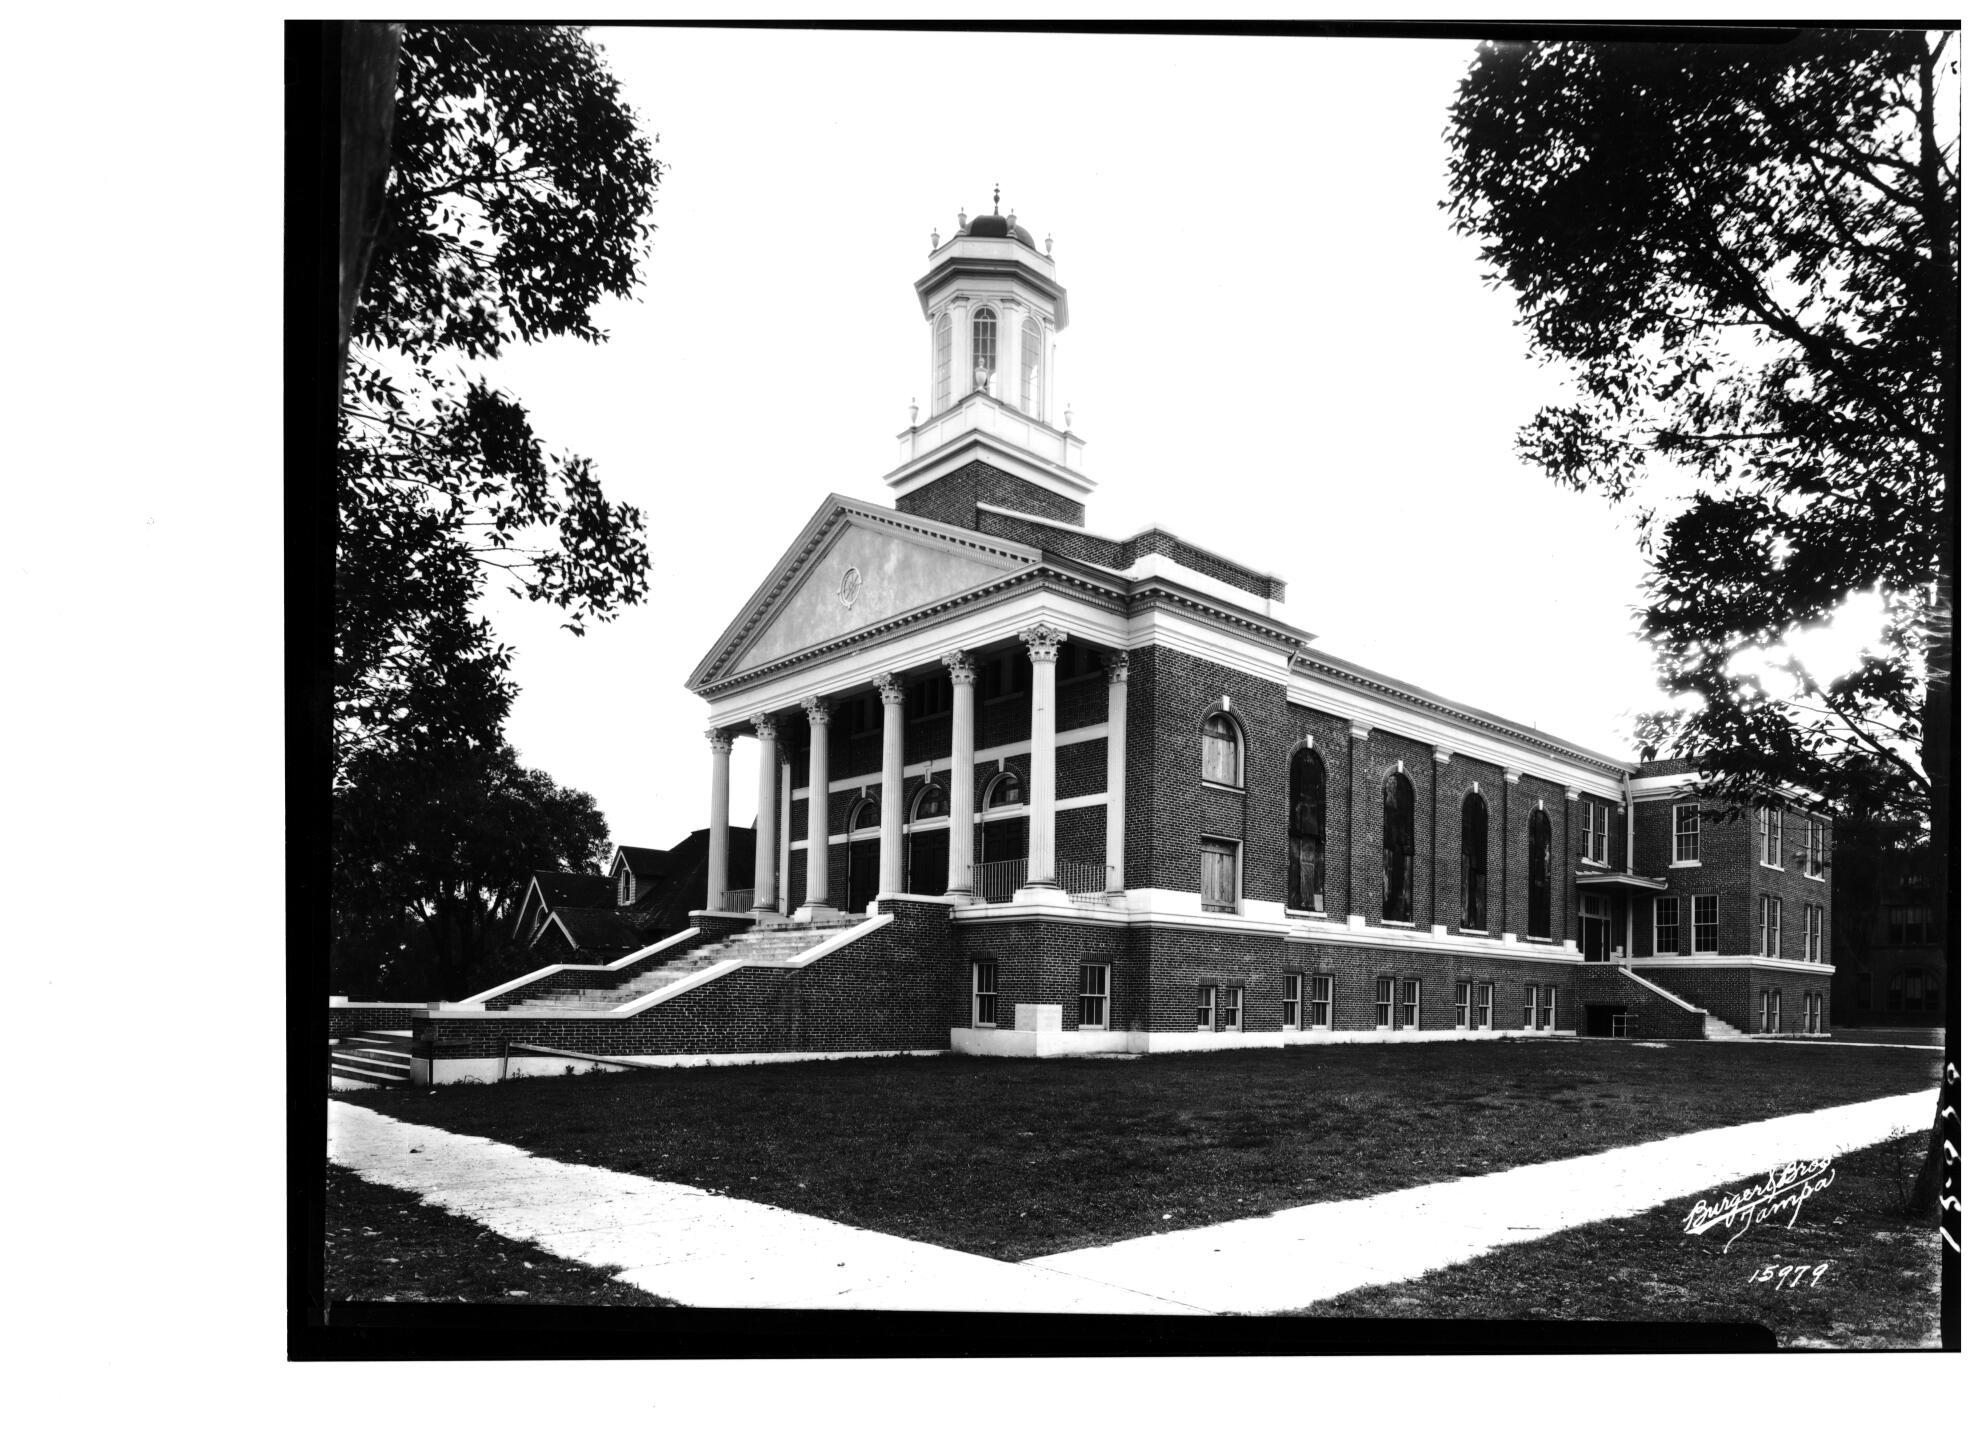 FIRST UNITED METHODIST CHURCH PLANT CITY FL.jpg